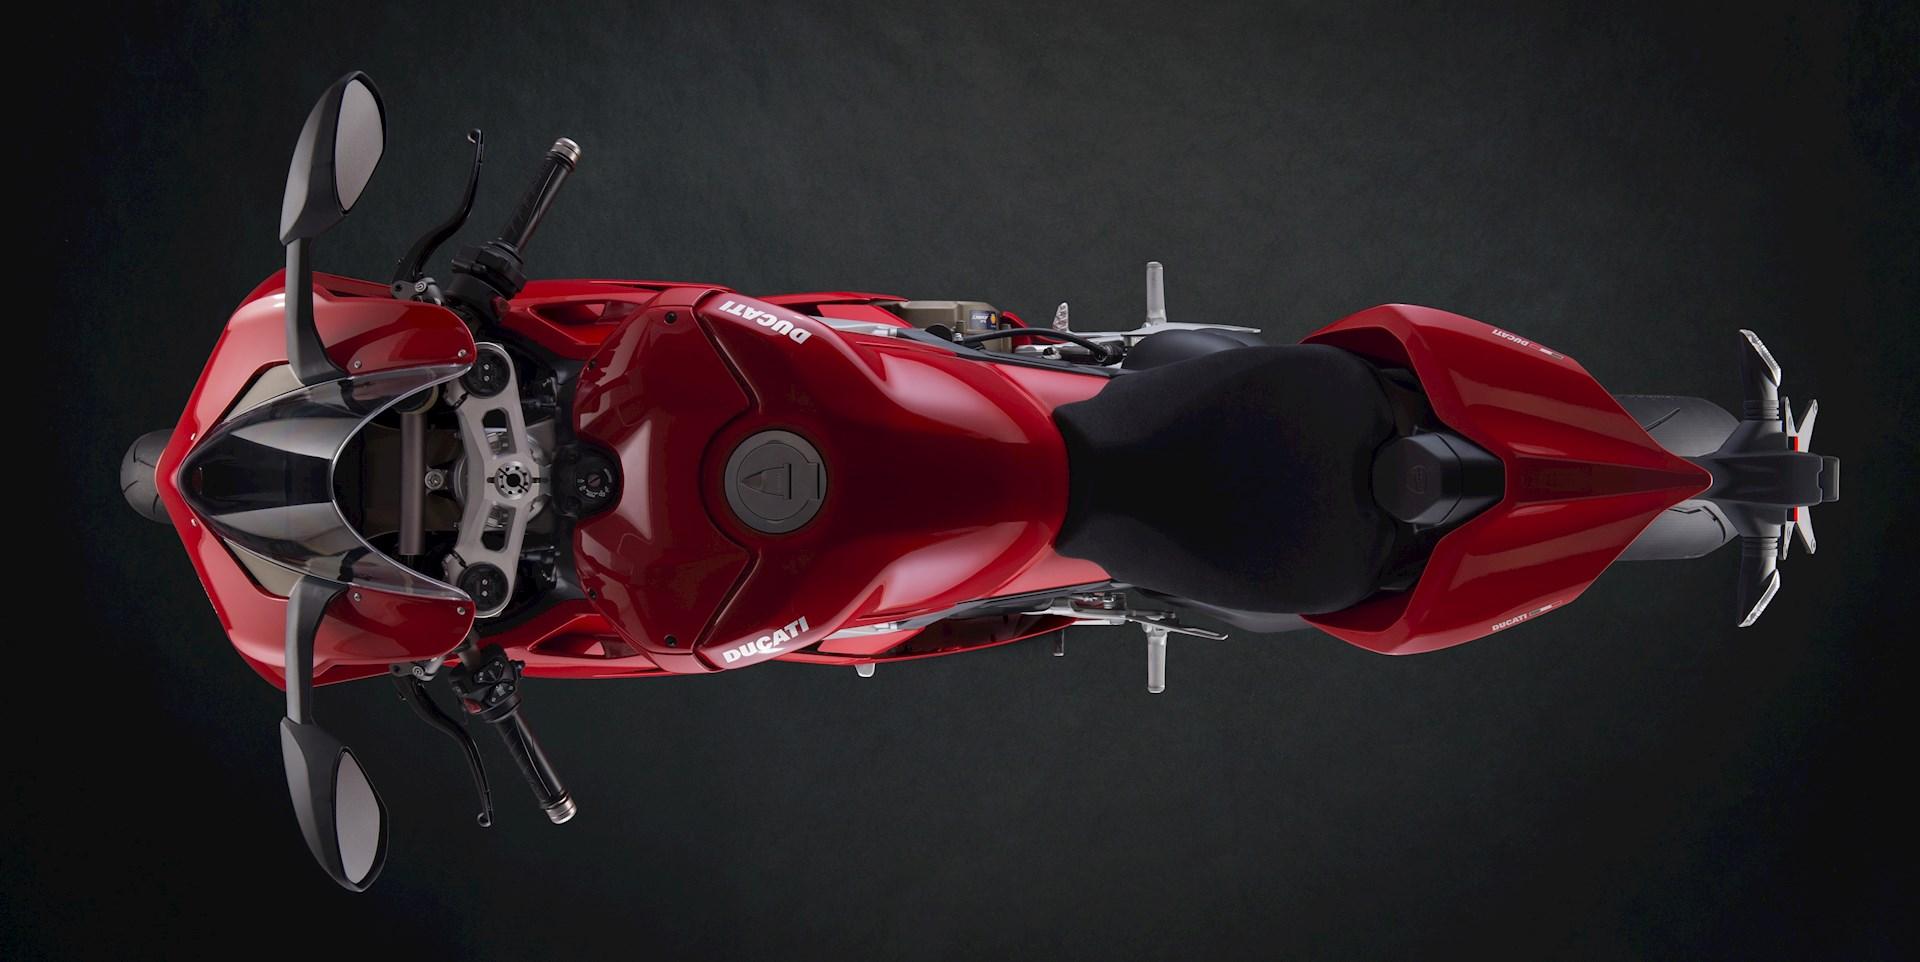 МОТОЦИКЛ DUCATI SUPERBIKE PANIGALE V4 S ― Артмото - купить квадроцикл в украине и харькове, мотоцикл, снегоход, скутер, мопед, электромобиль